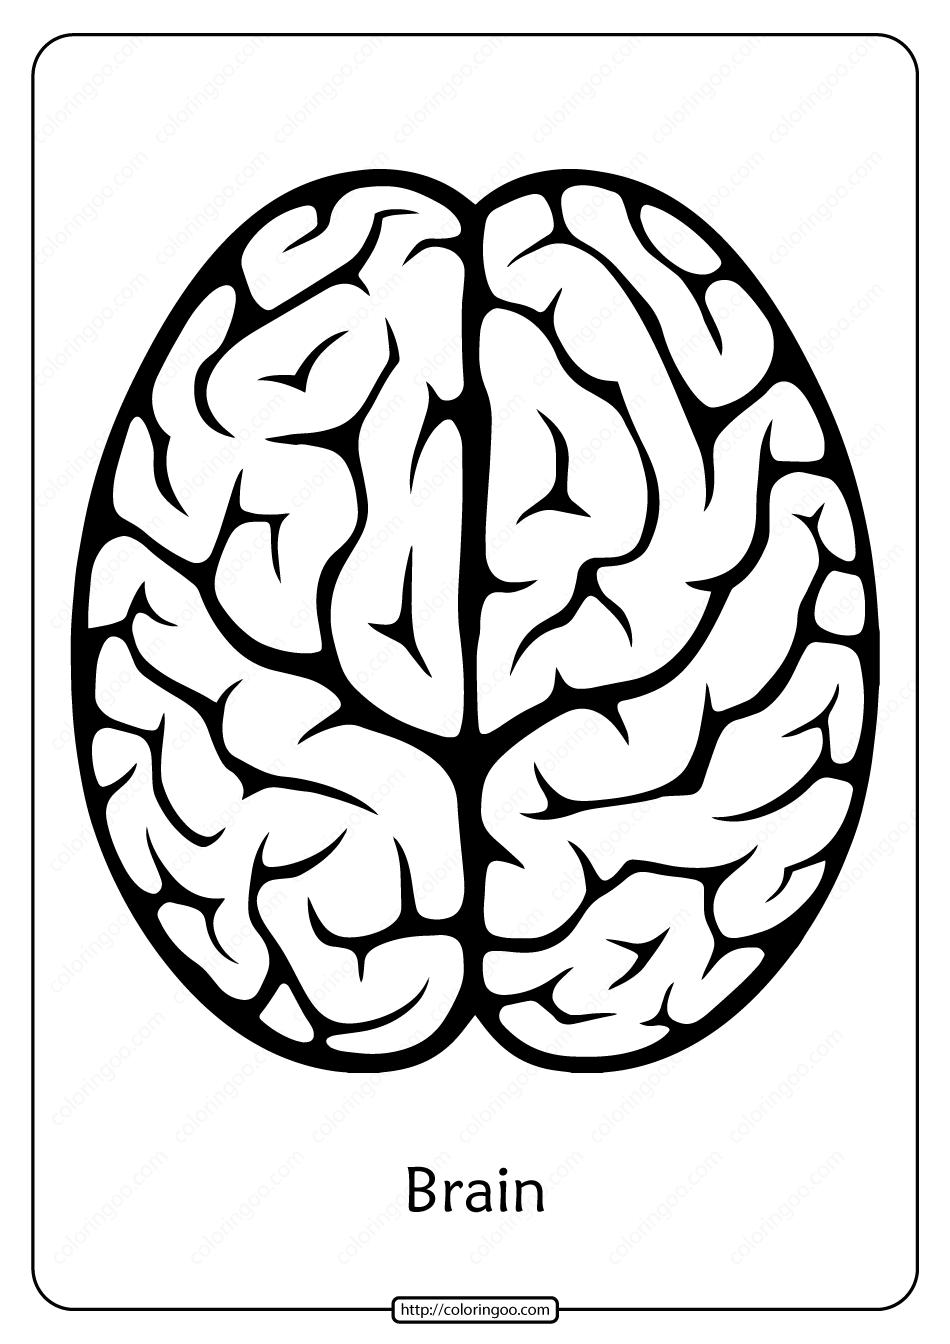 Free Printable Brain Outline Pdf Coloring Pages Coloring Pages Outline Free Printables